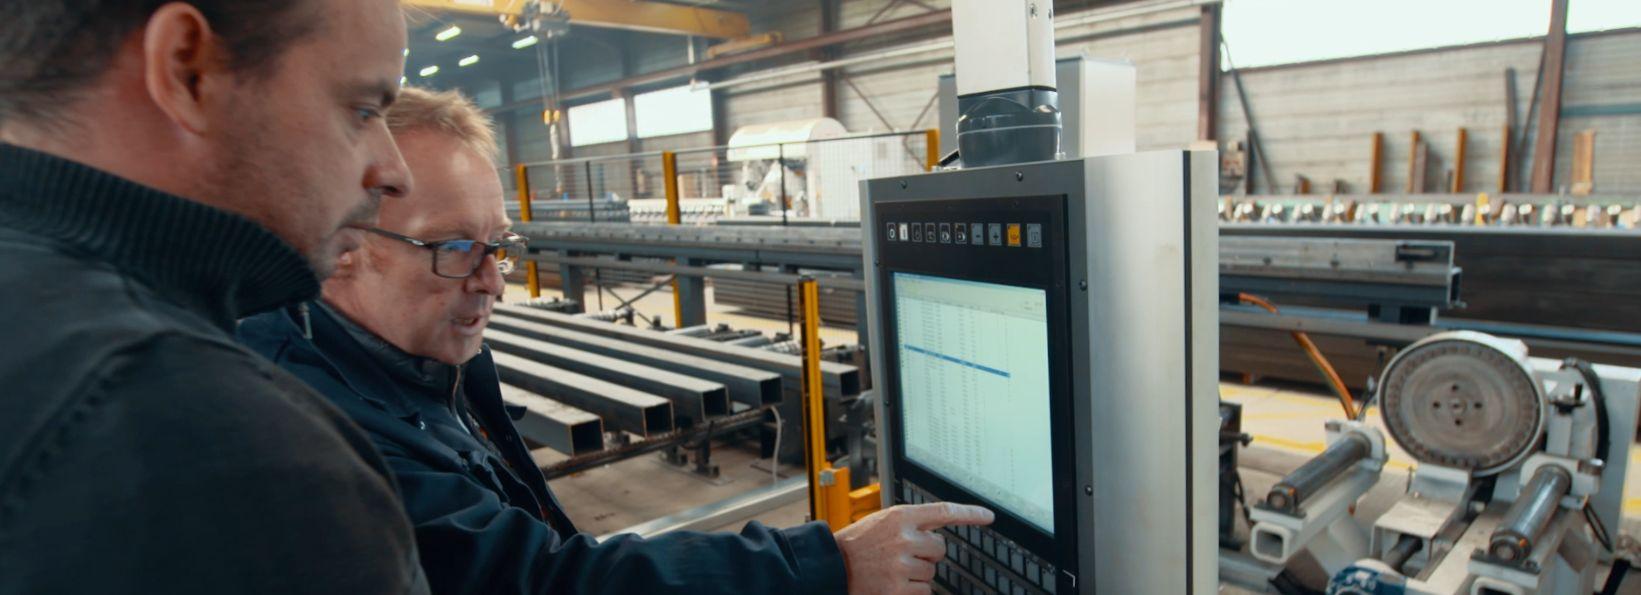 training setup structural steel fabricator software